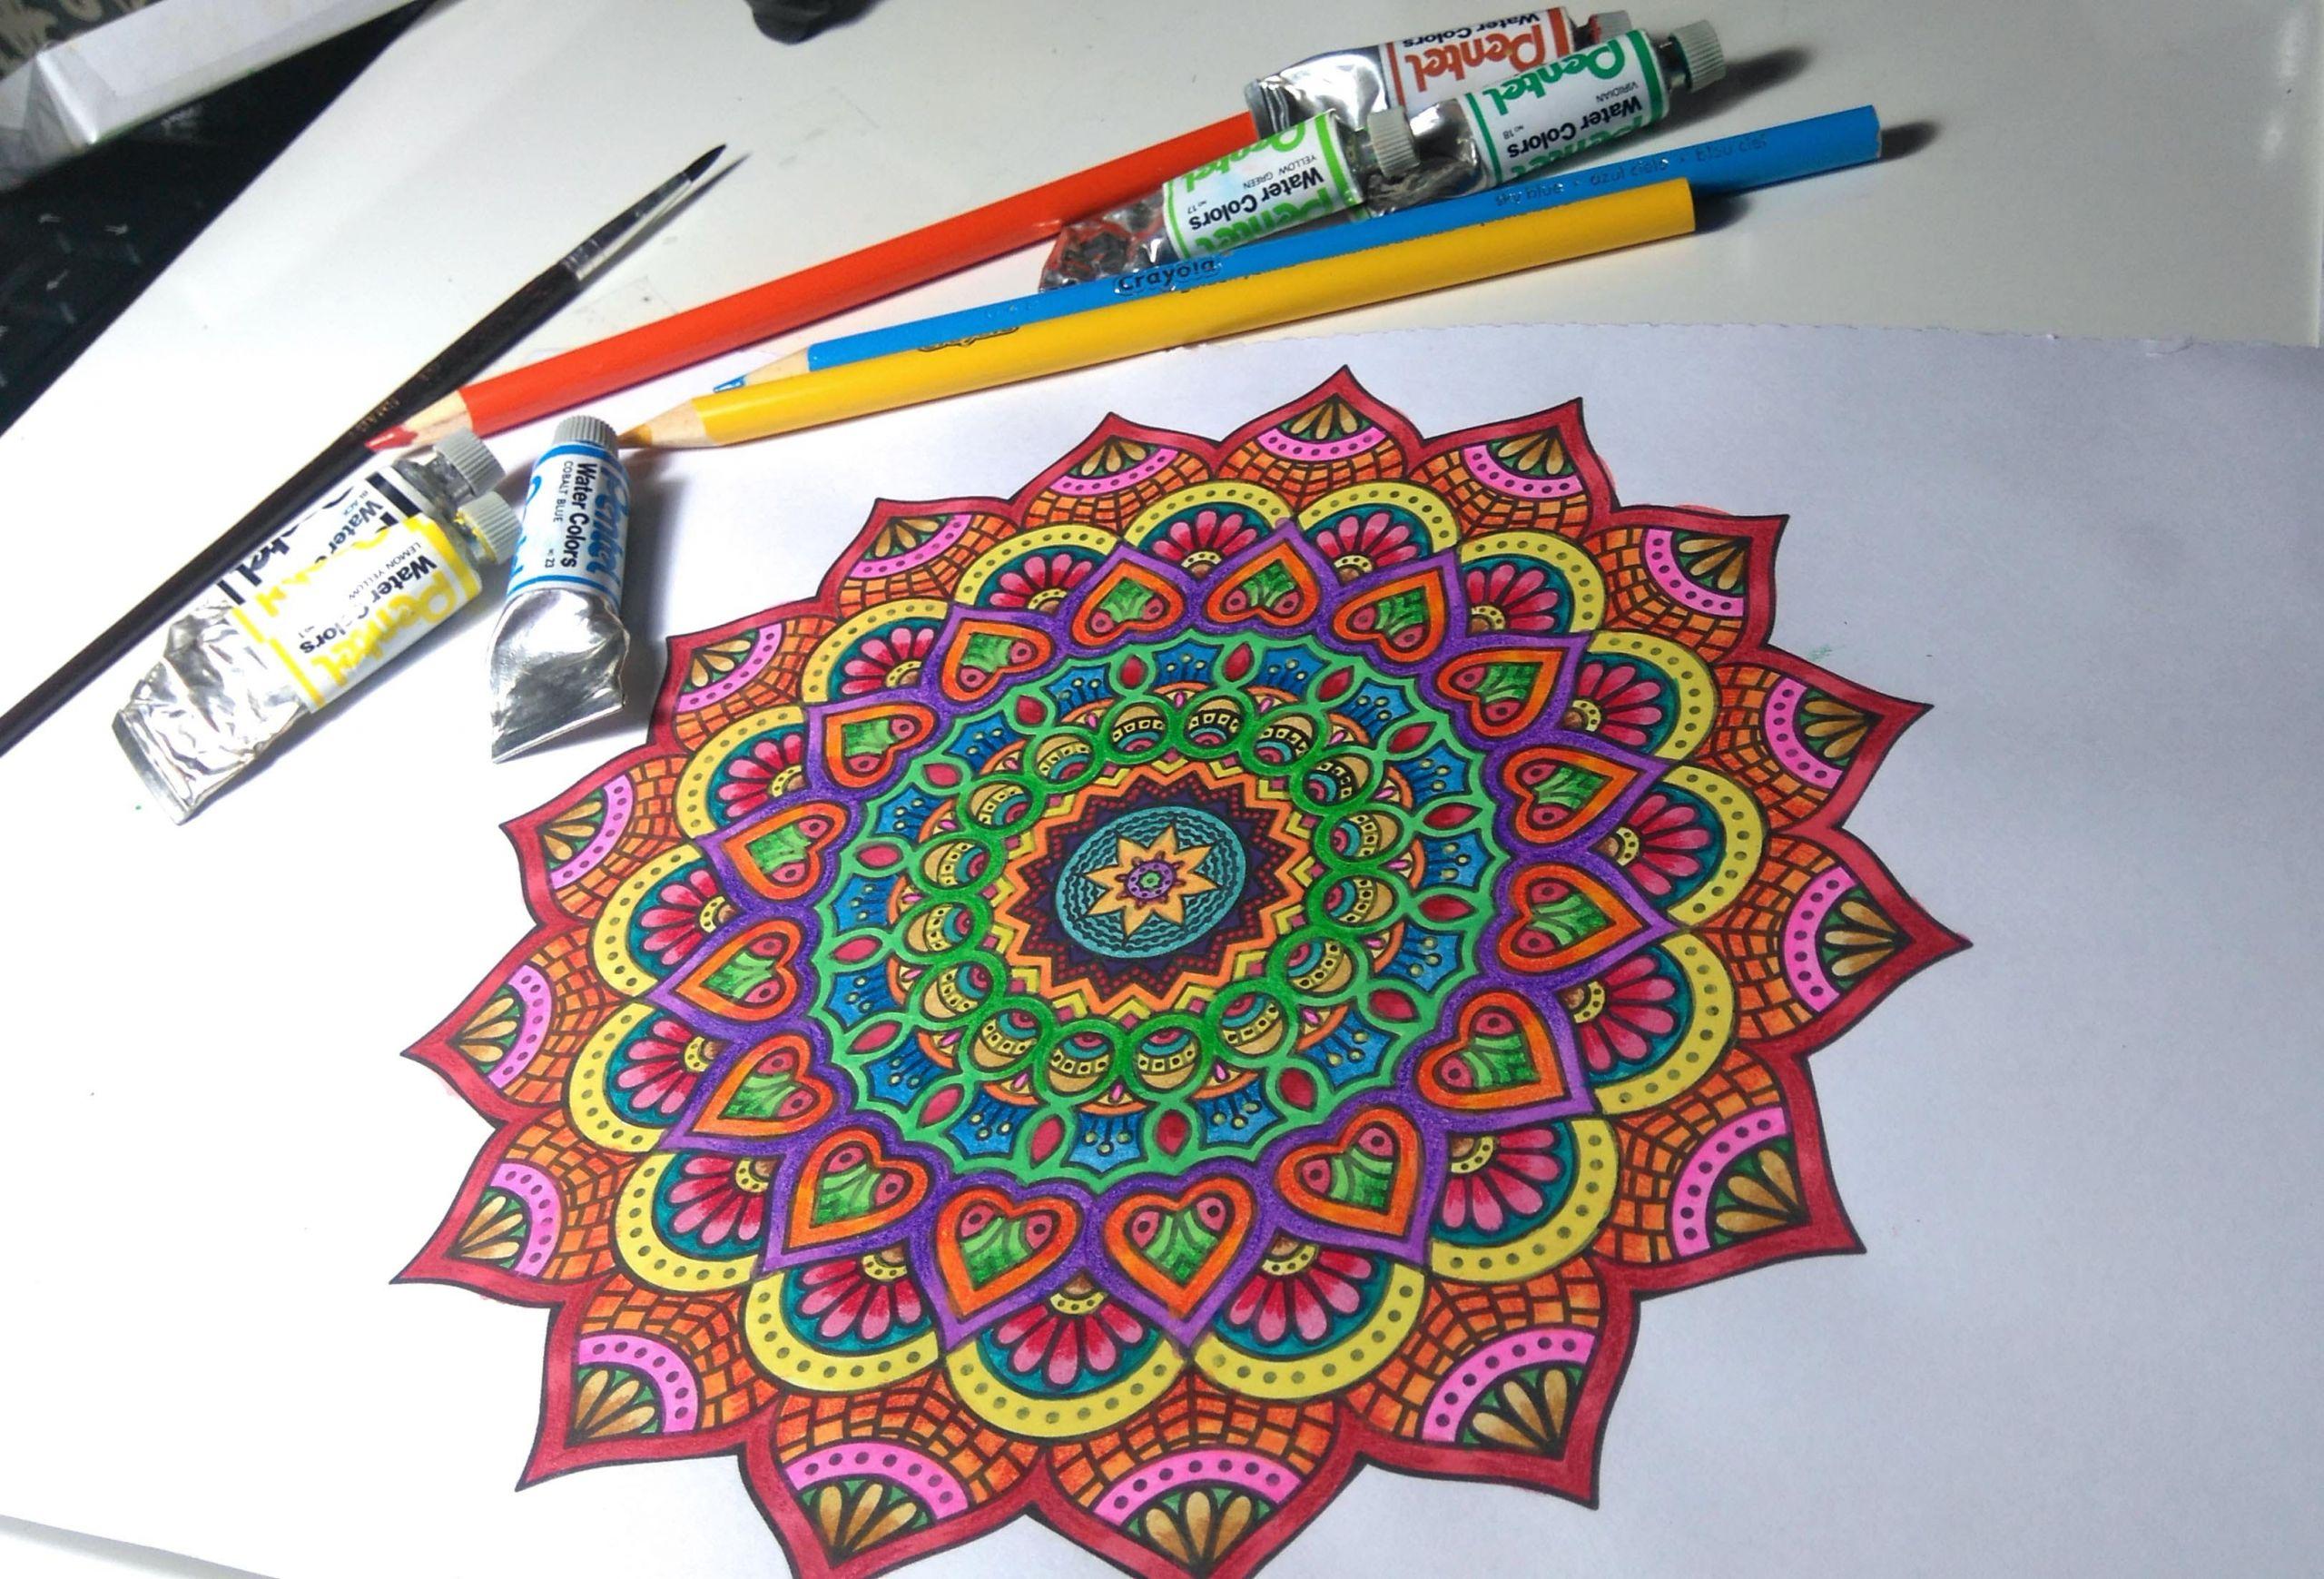 id C3 A9e dessin coloriage mandala motifs floraux activit C3 A9 manuelle adulte facile a realiser id C3 A9e cr C3 A9ative